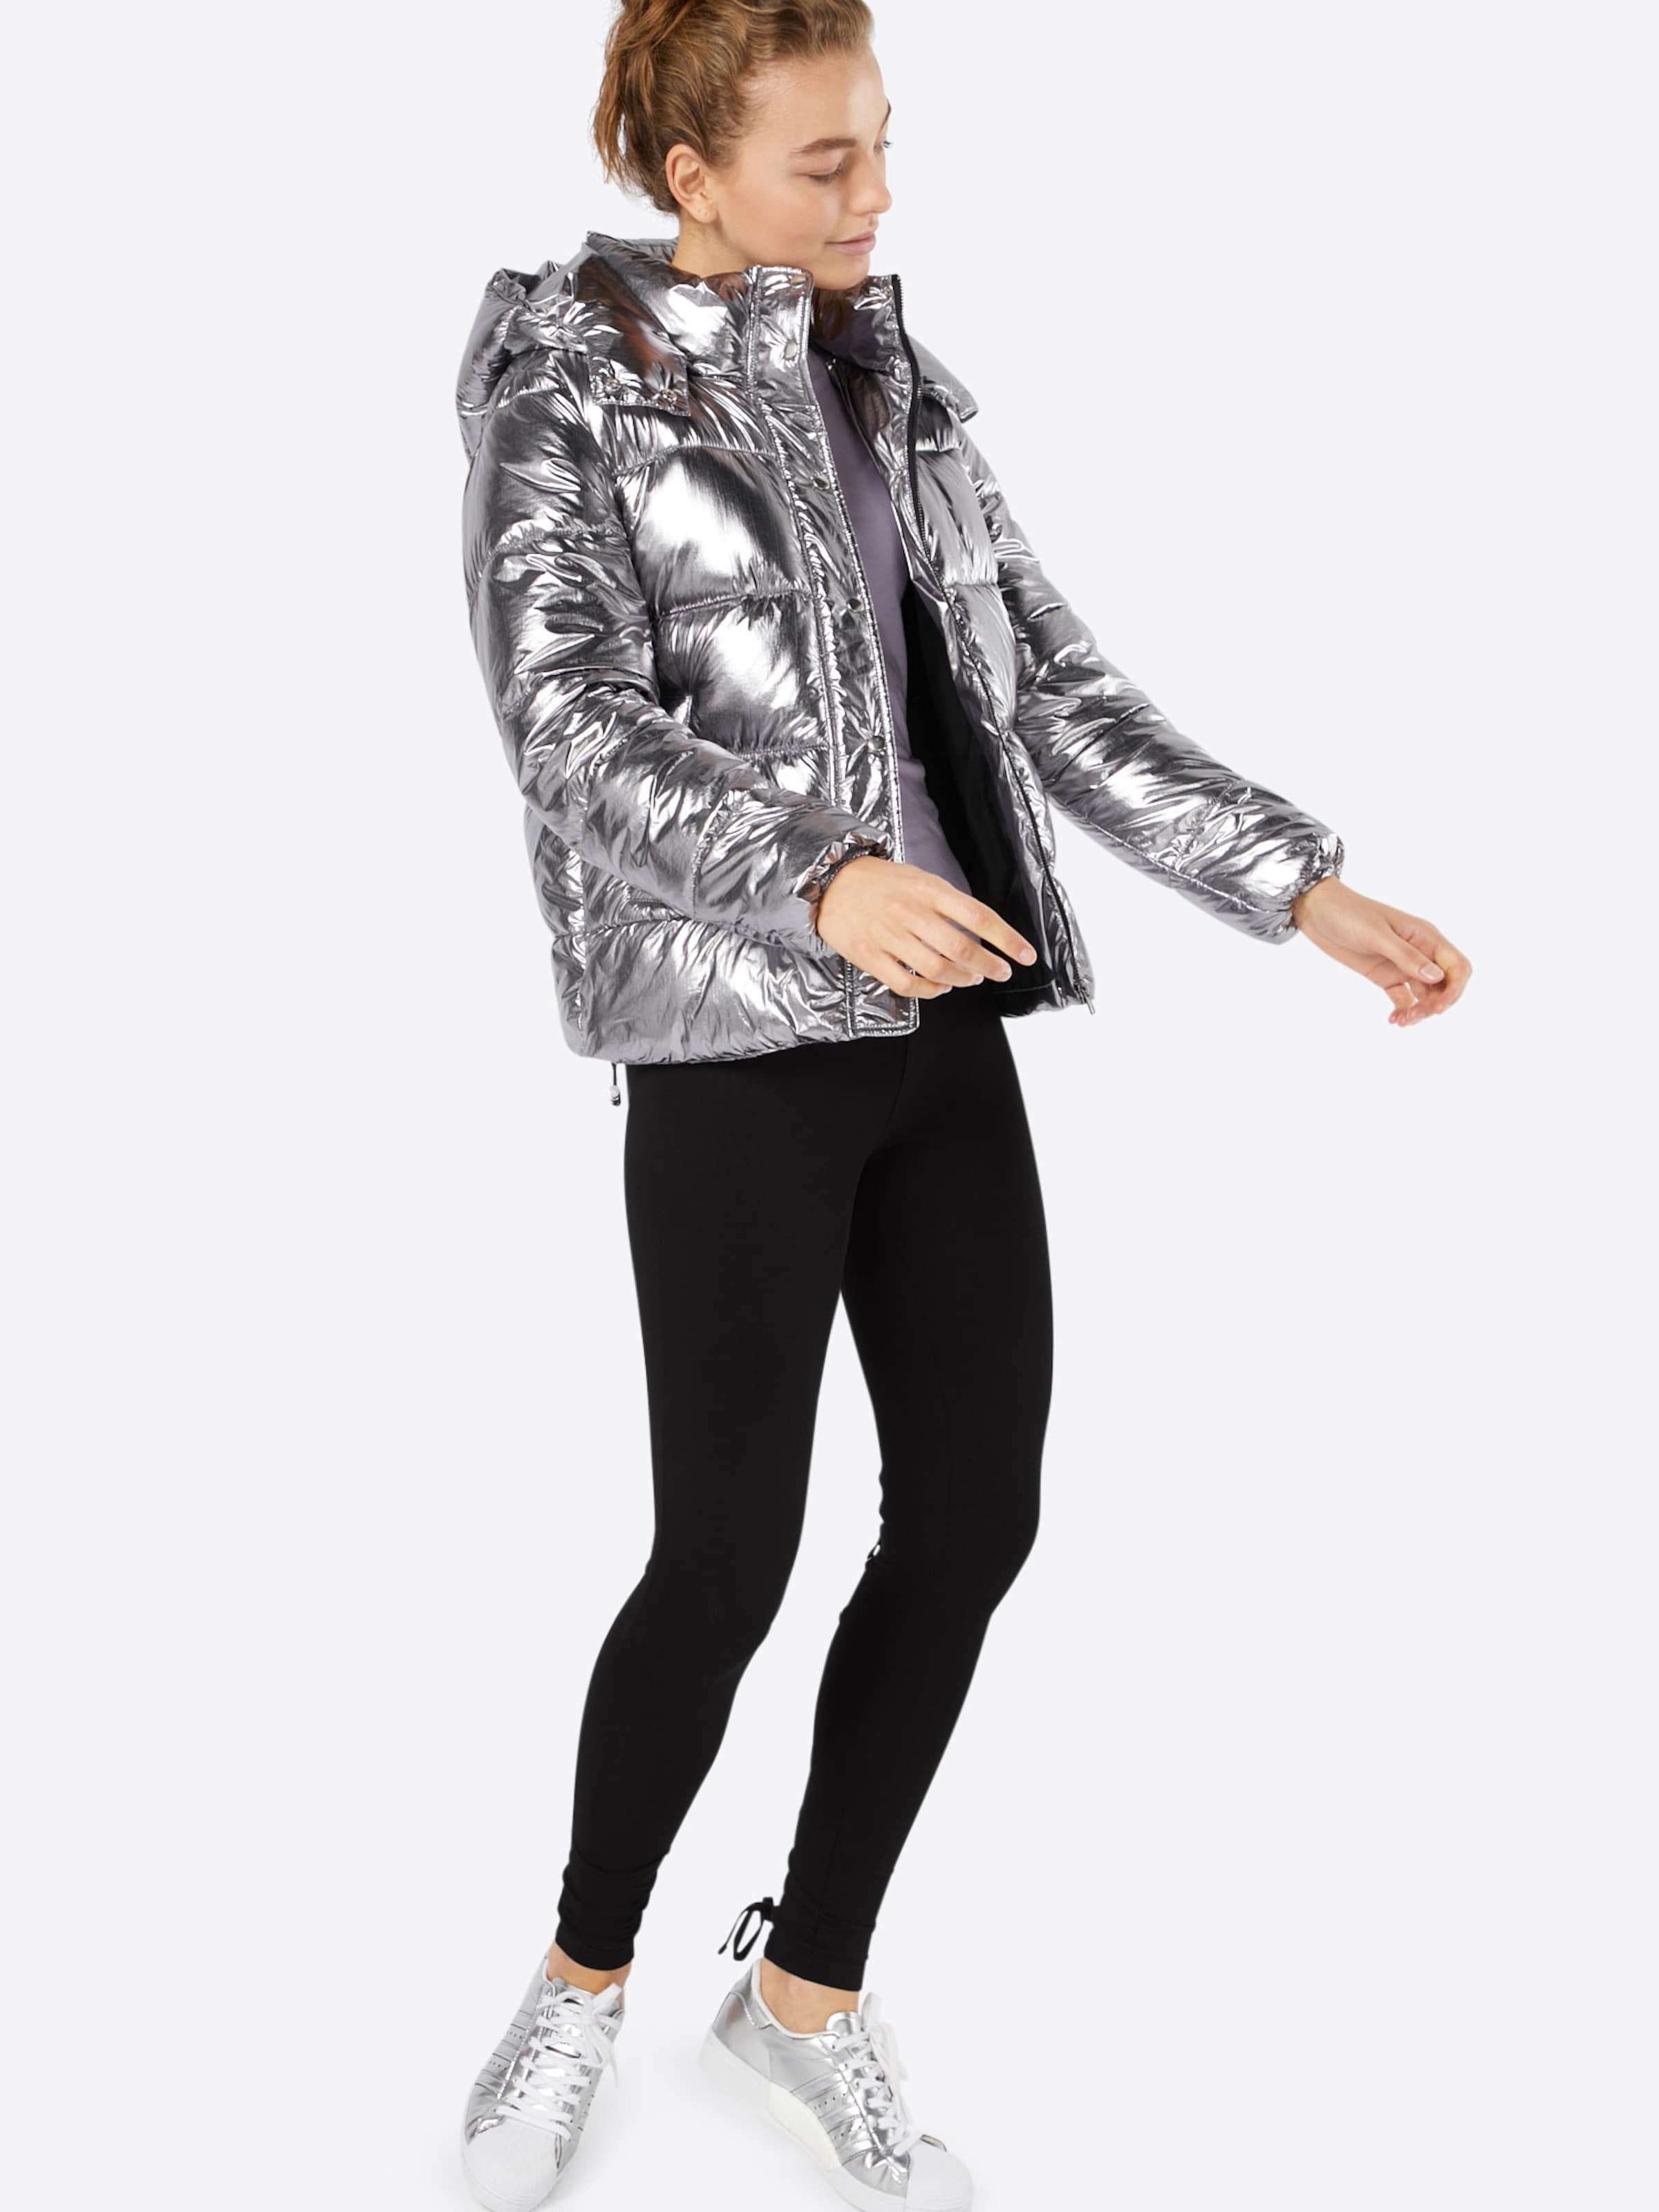 Urban Classics Skinny Leggings 'Laced Up Back' Rabatt Kosten Rabatt Niedrig Kosten Verkauf Blick Günstig Kaufen Exklusiv Durchsuche m4rbGQn